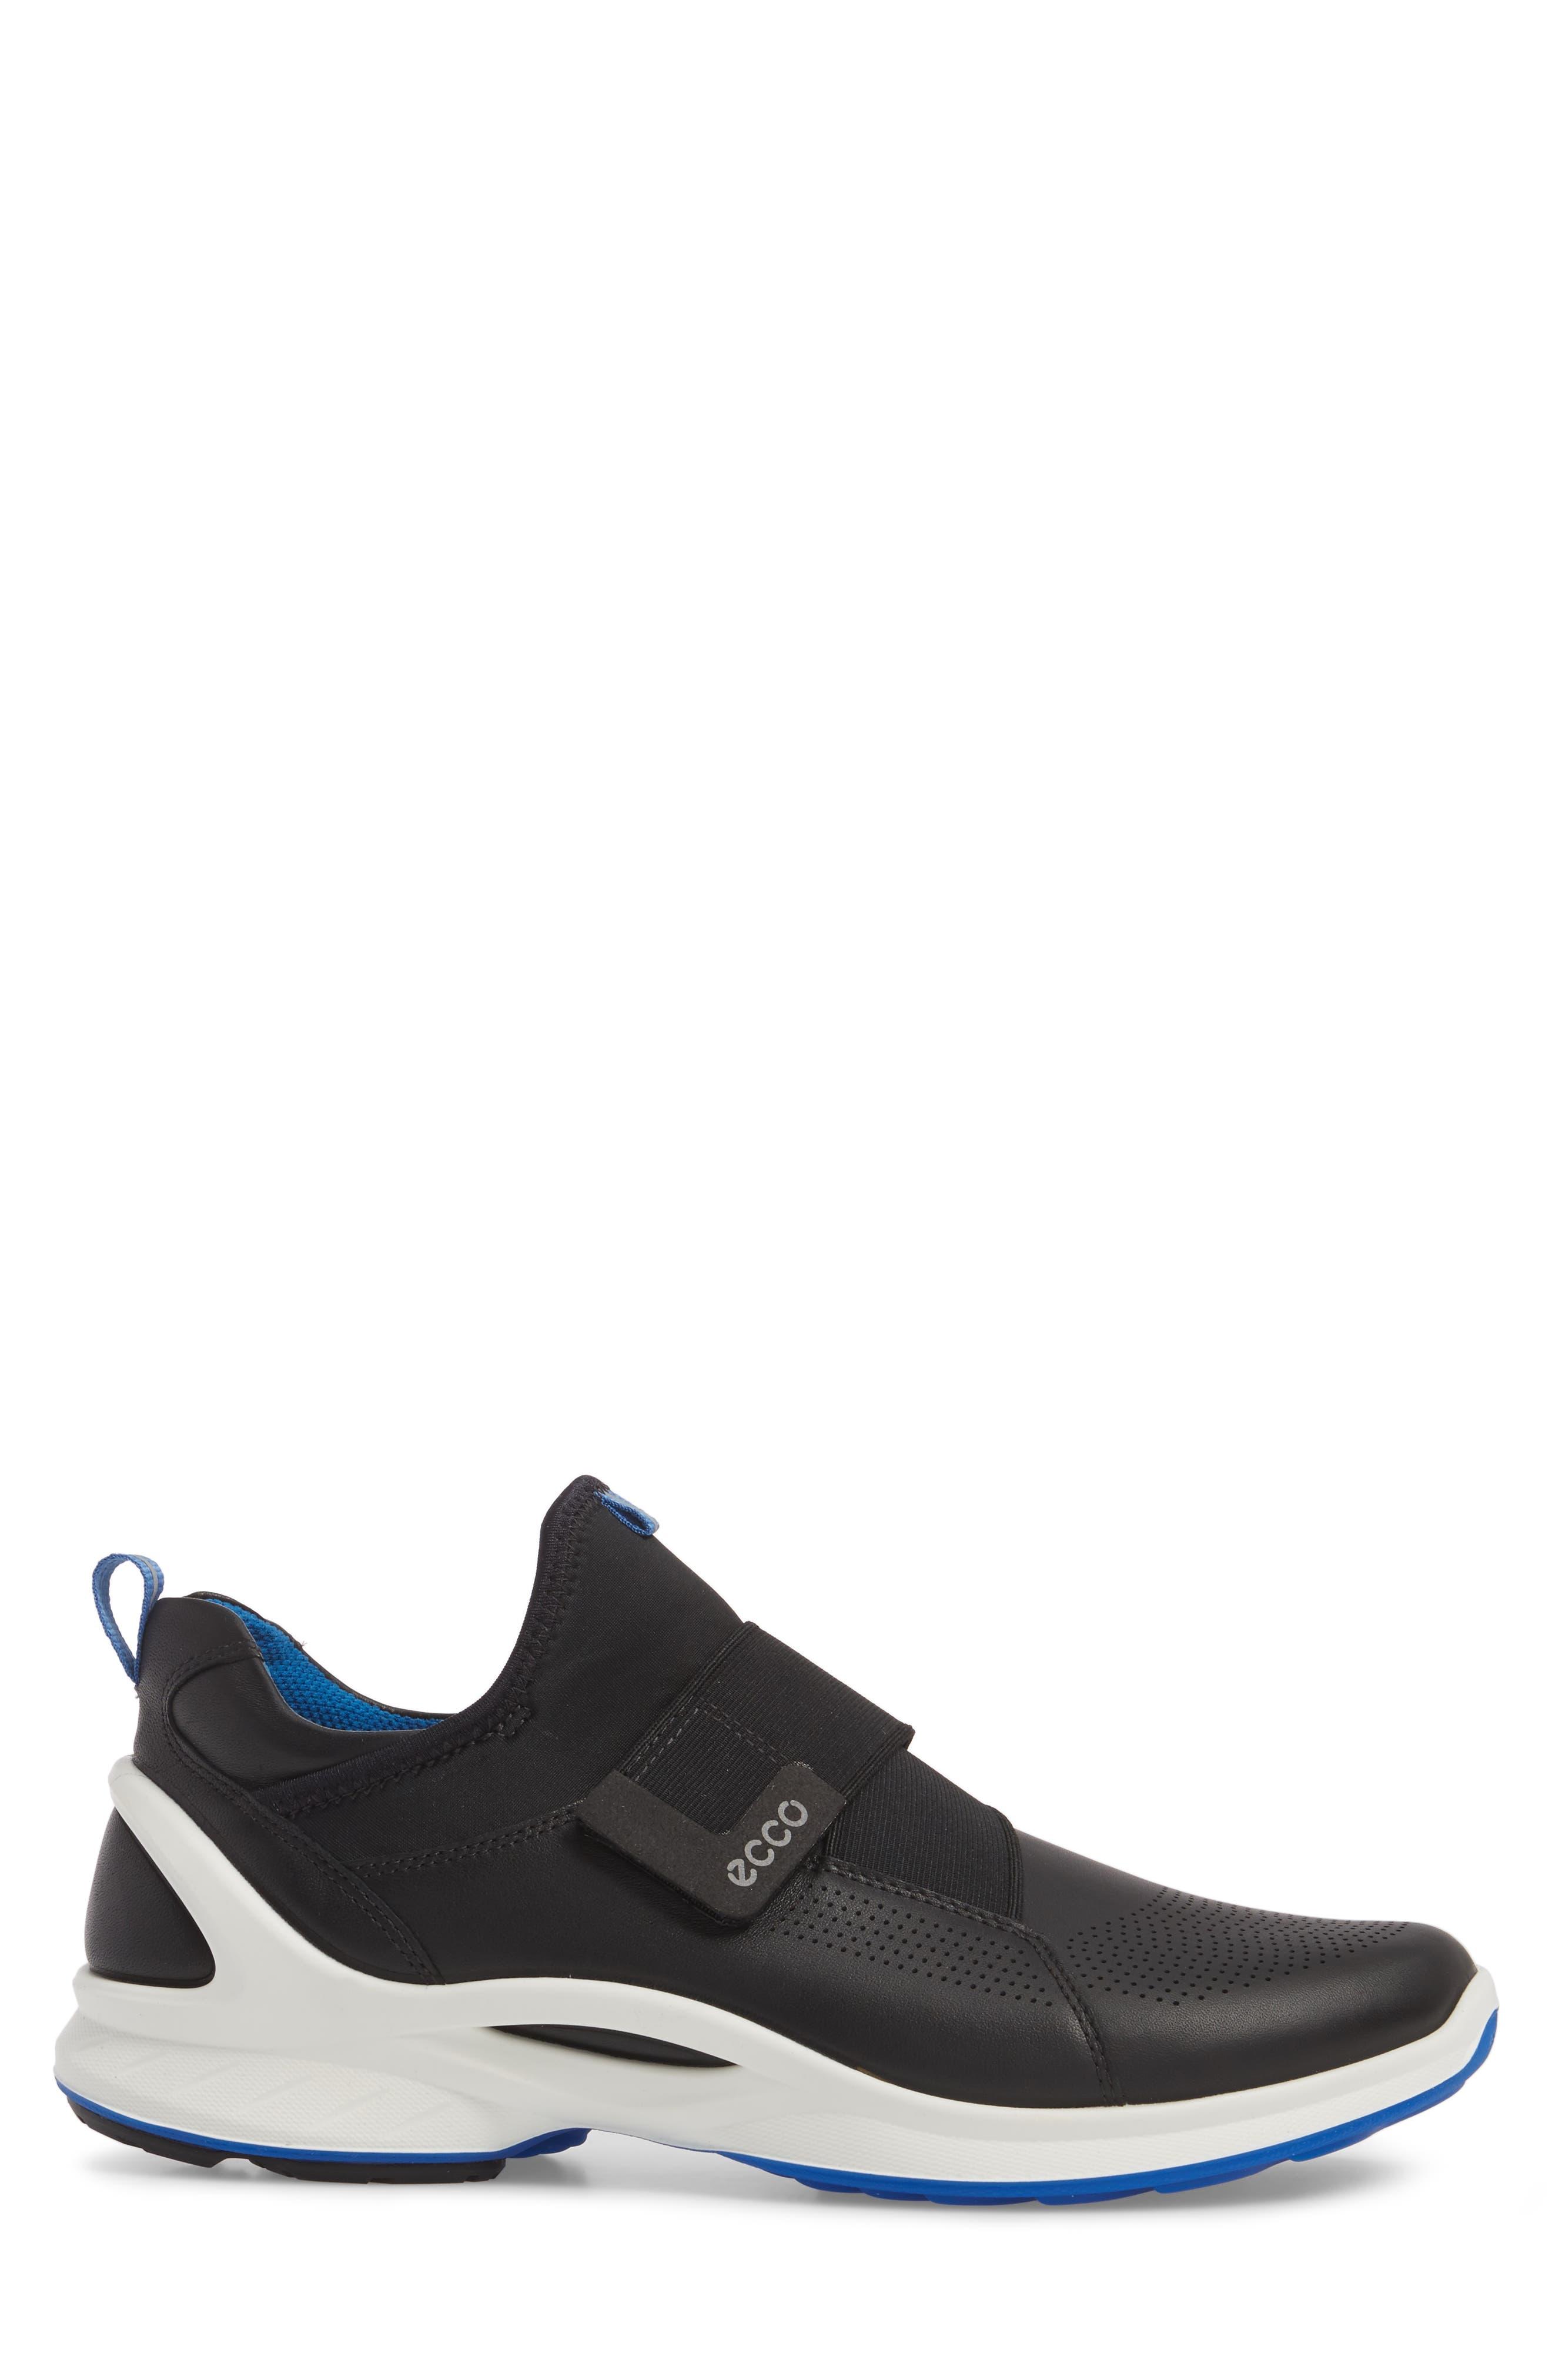 BIOM Fjuel Band Sneaker,                             Alternate thumbnail 3, color,                             009